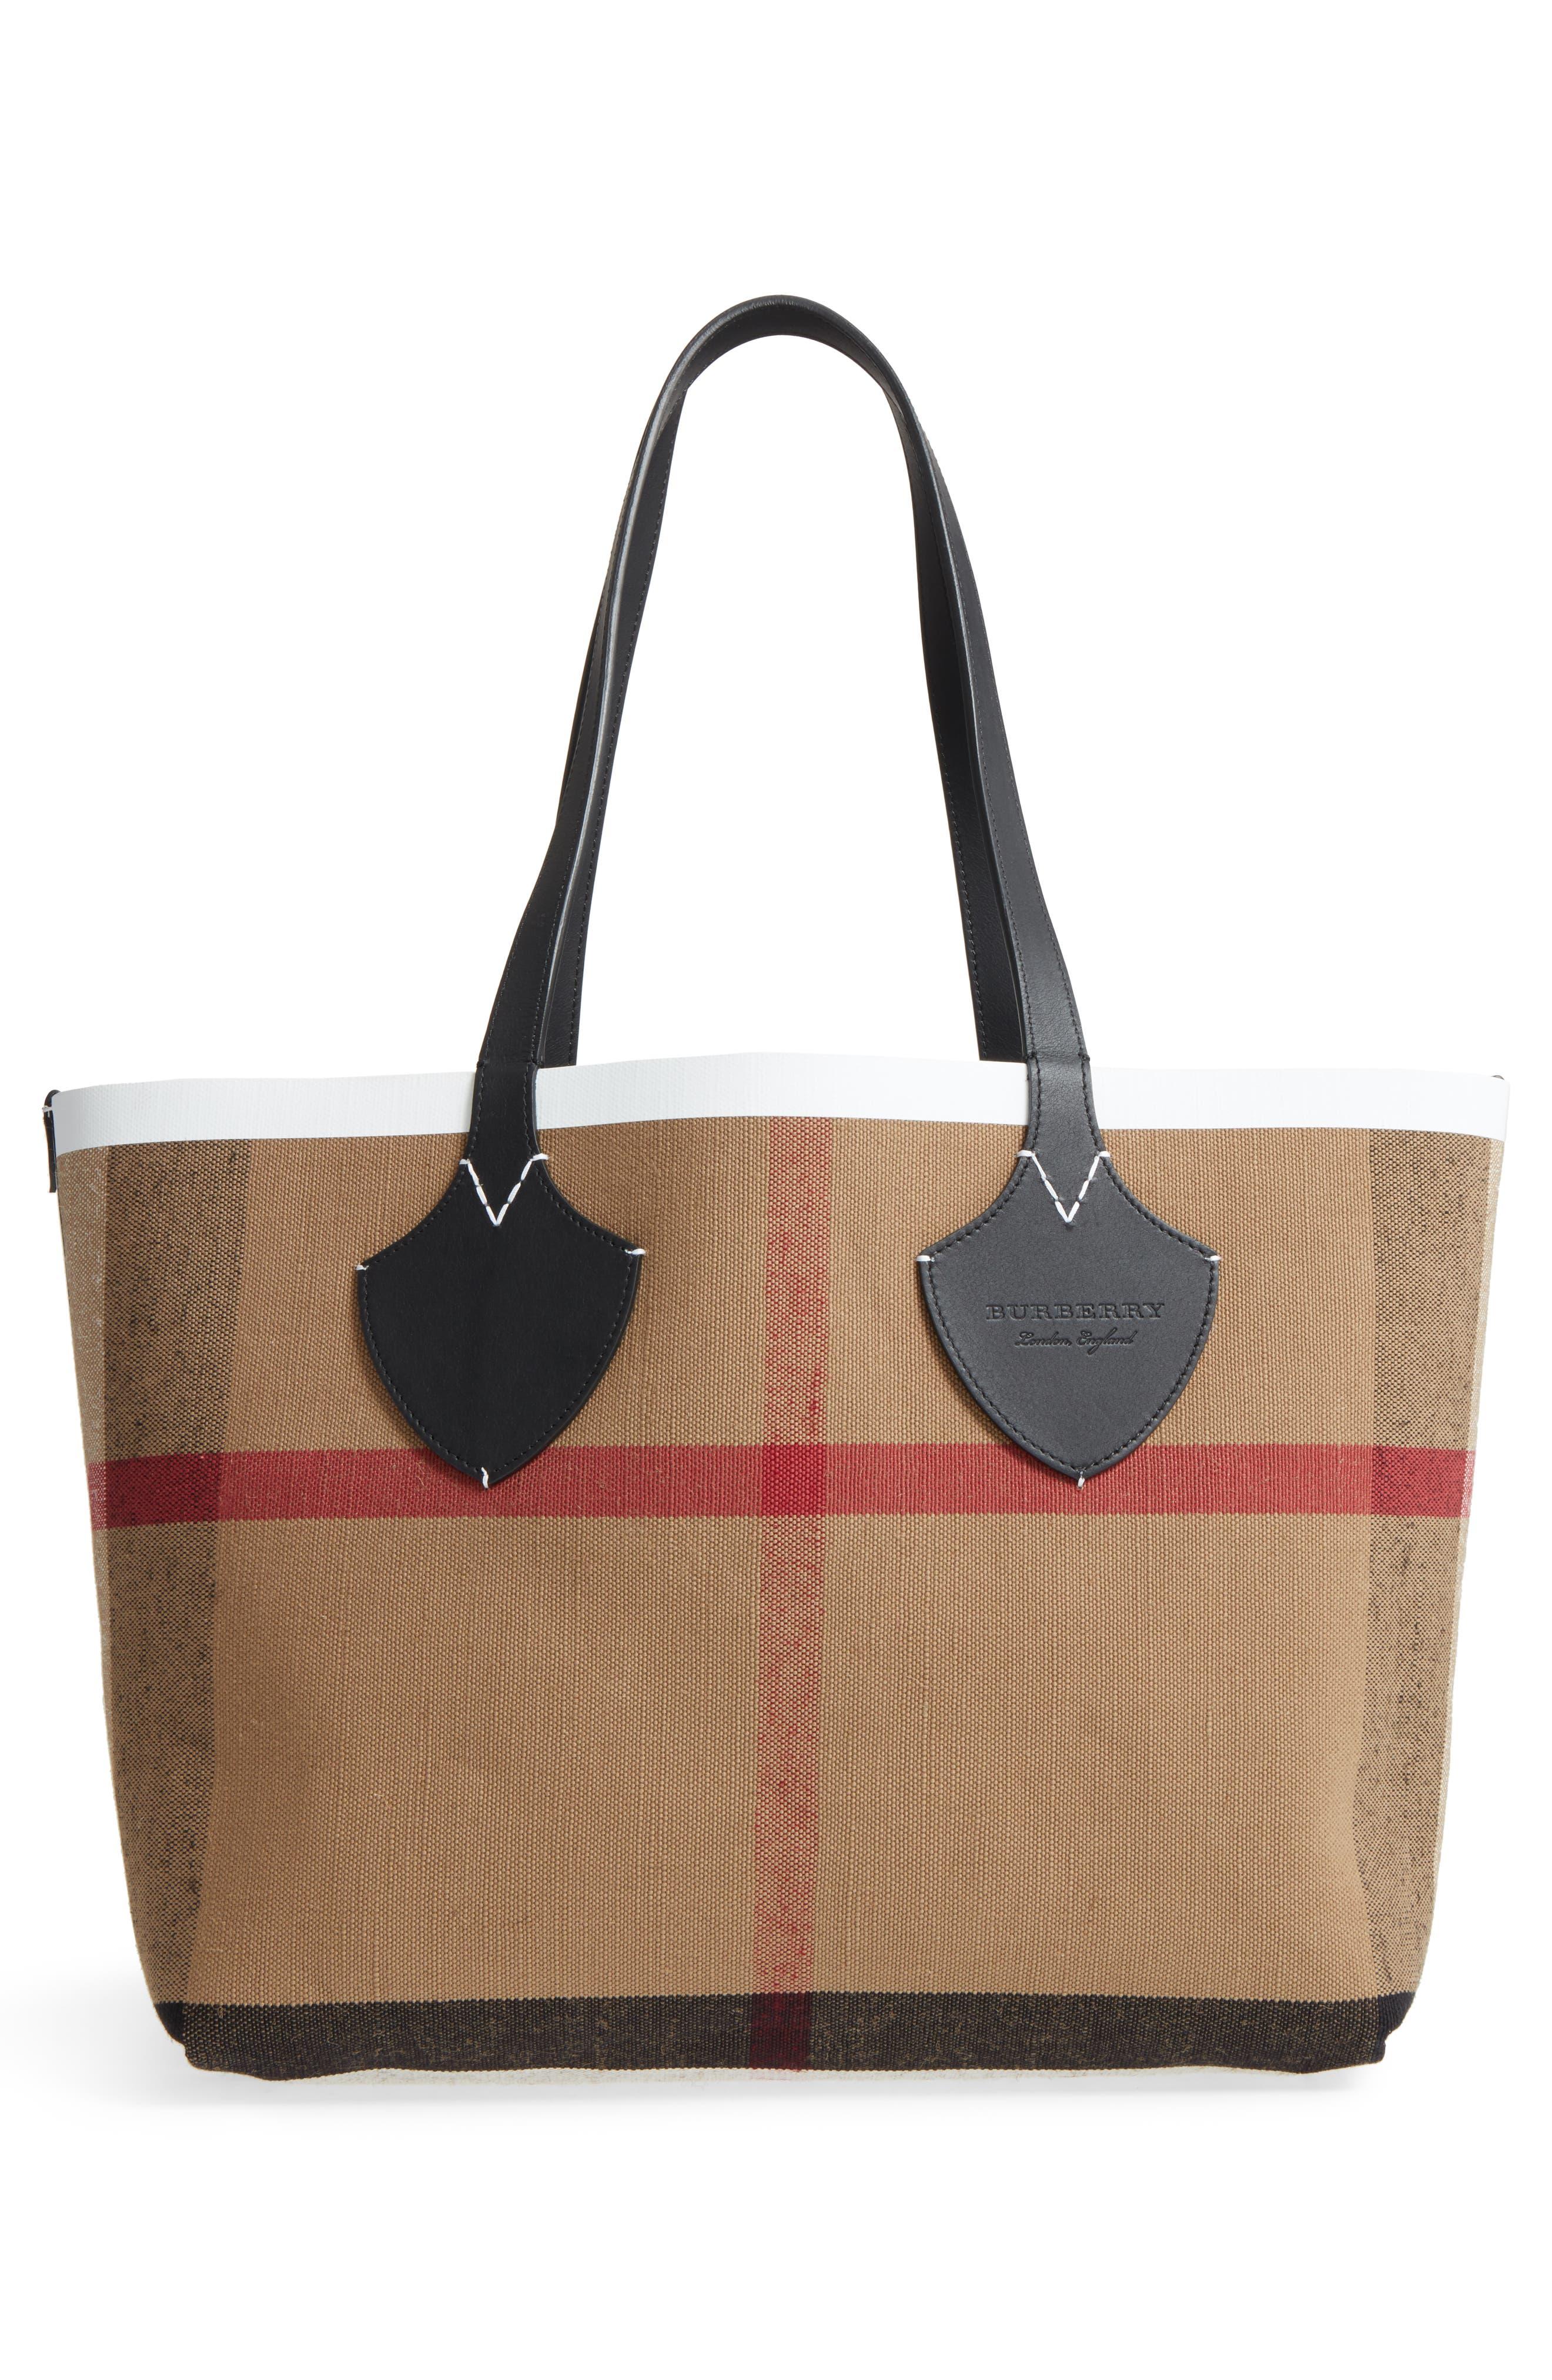 Medium Reversible Leather & Check Canvas Tote,                             Alternate thumbnail 3, color,                             BLACK/ WHITE